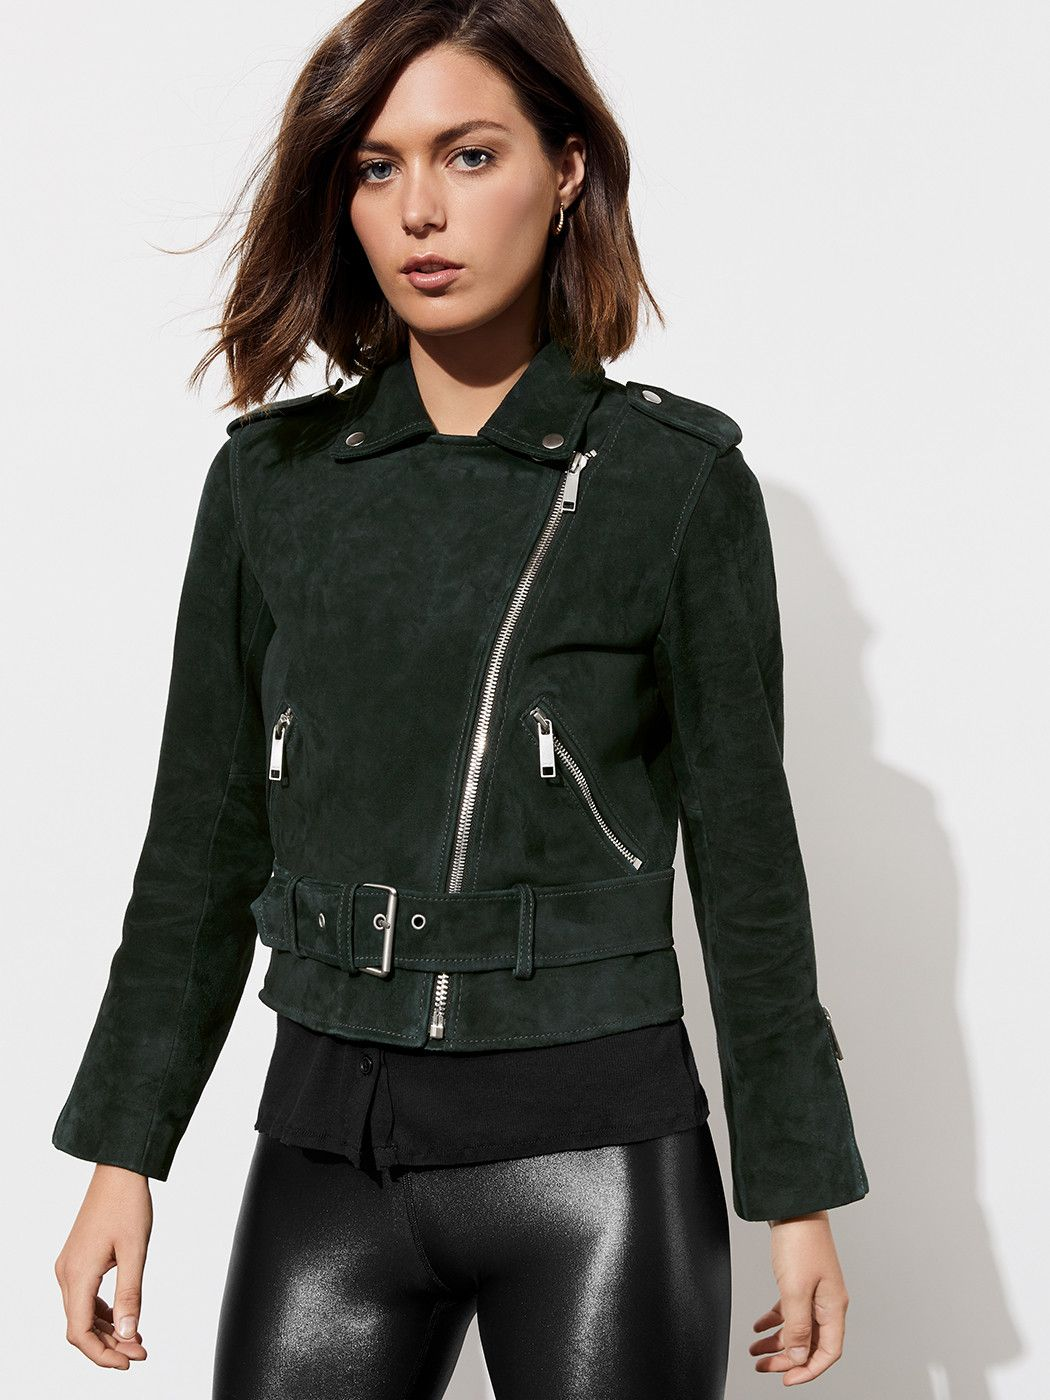 Ana Suede Biker Jacket in Hunters Green Jackets for